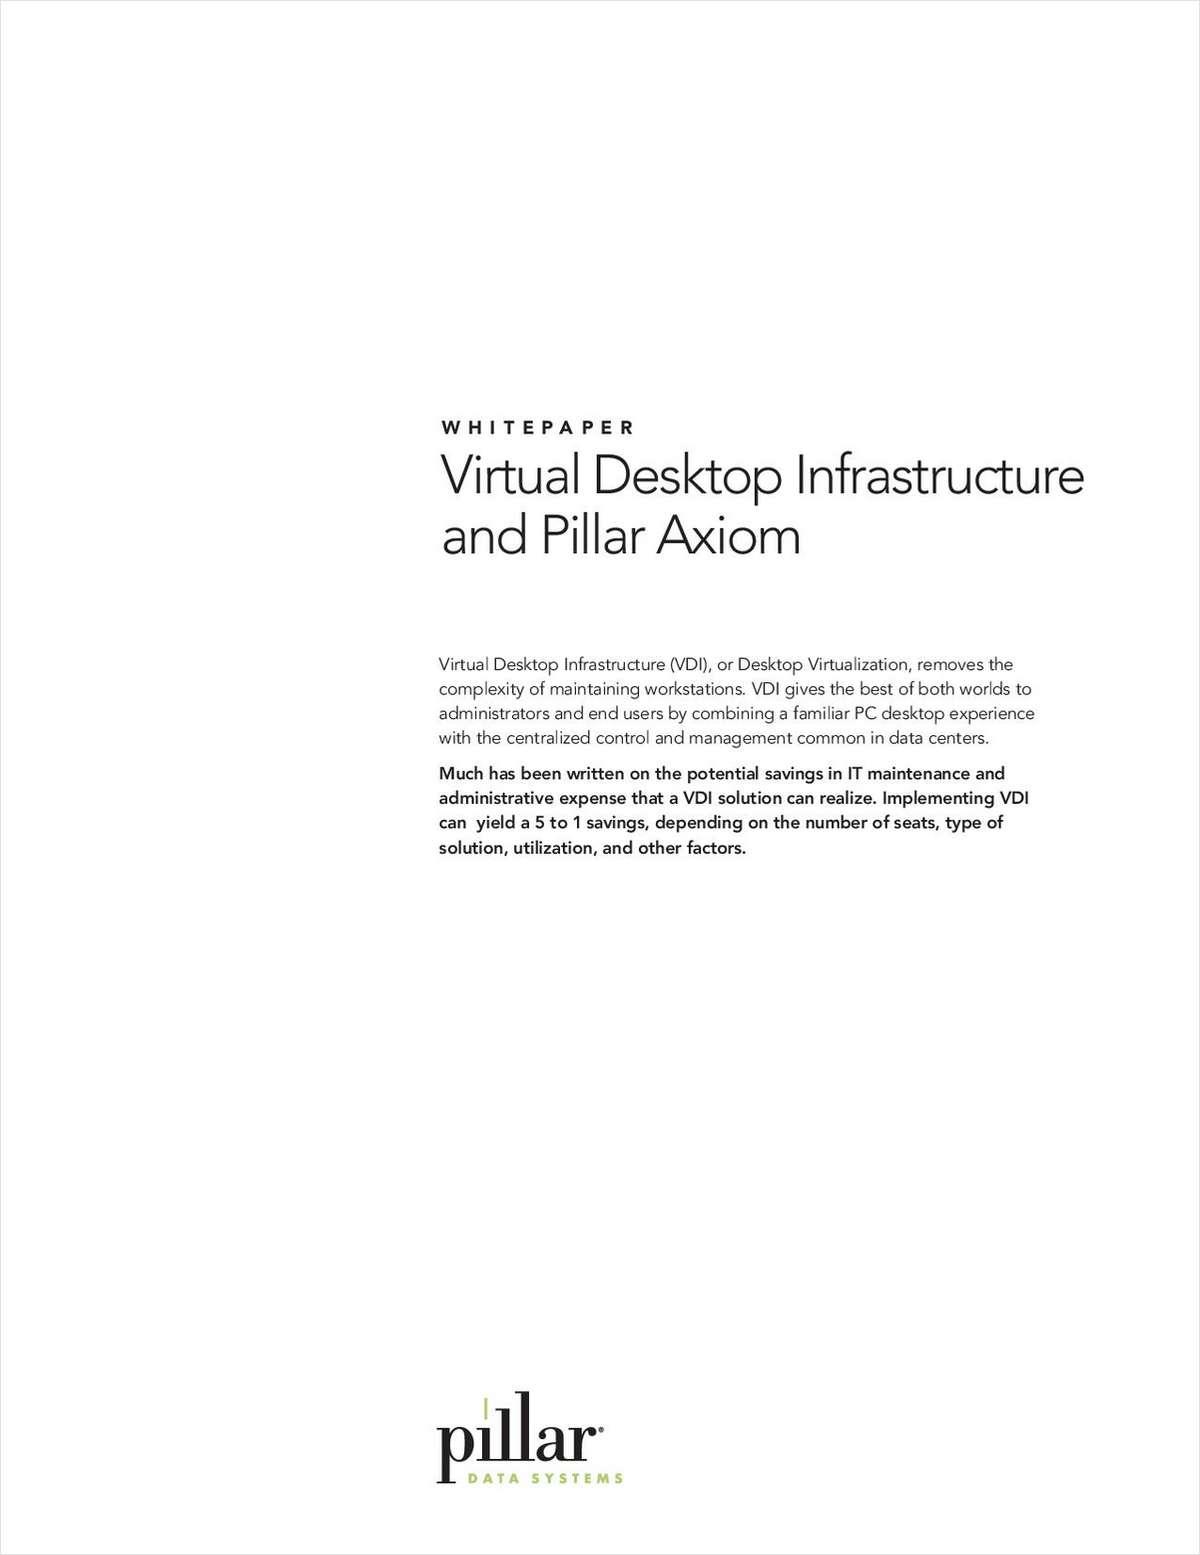 Benefits of a Virtual Desktop Infrastructure